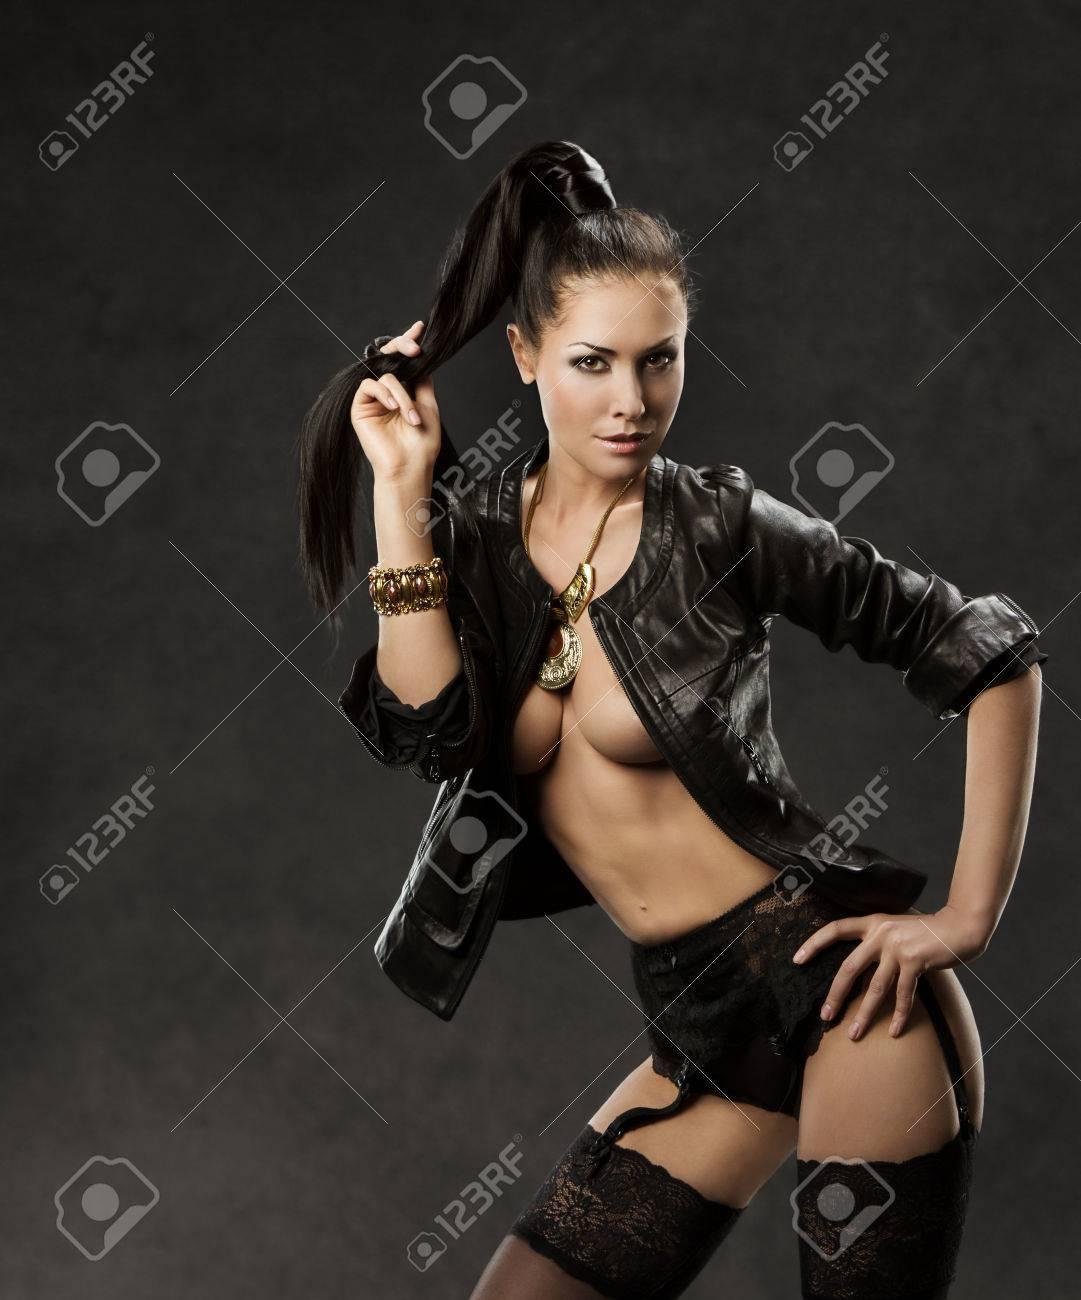 Leather Stockings Erotic Photo